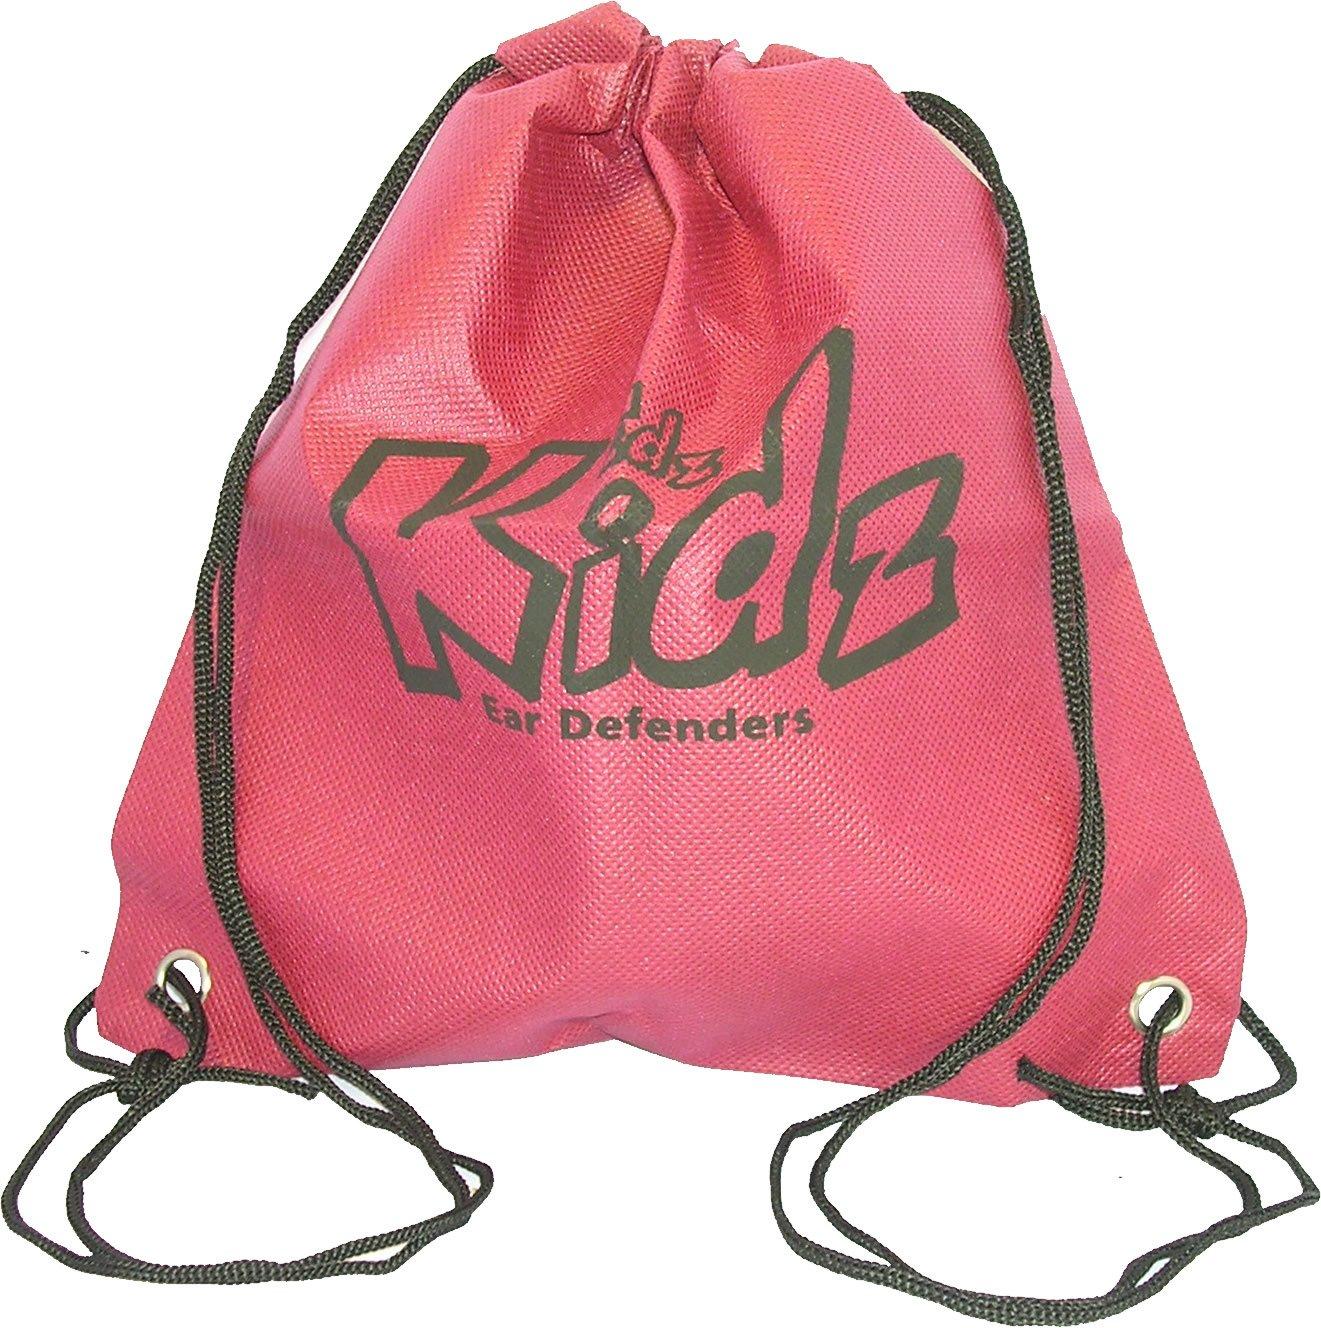 EDZ Kidz –  Storage Bag for Children' s Ear Defenders (Black) EKDSB1